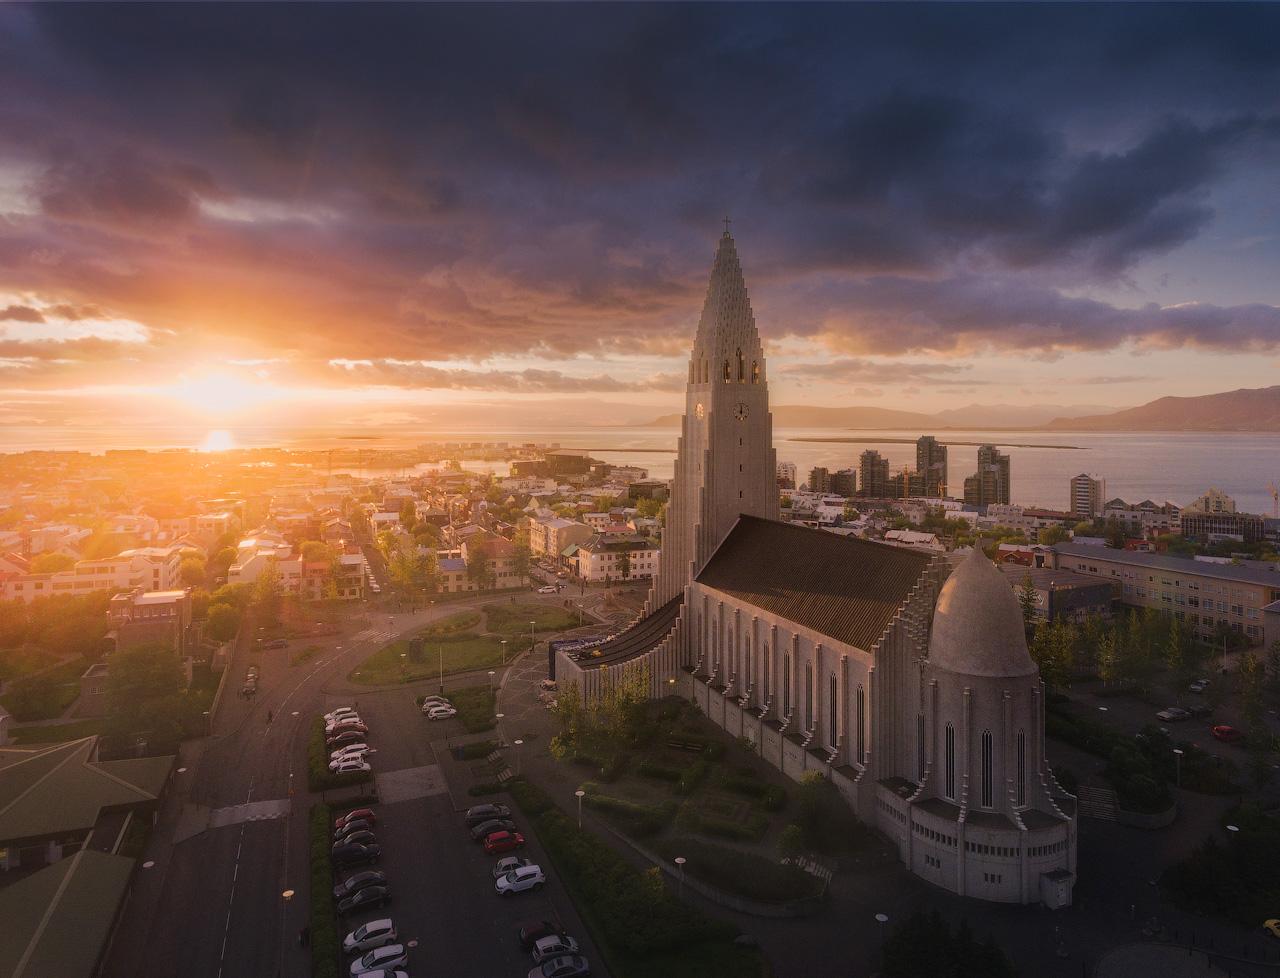 Die berühmte Kirche Hallgrimskirkja in Reykjavik in der Sommersonne.